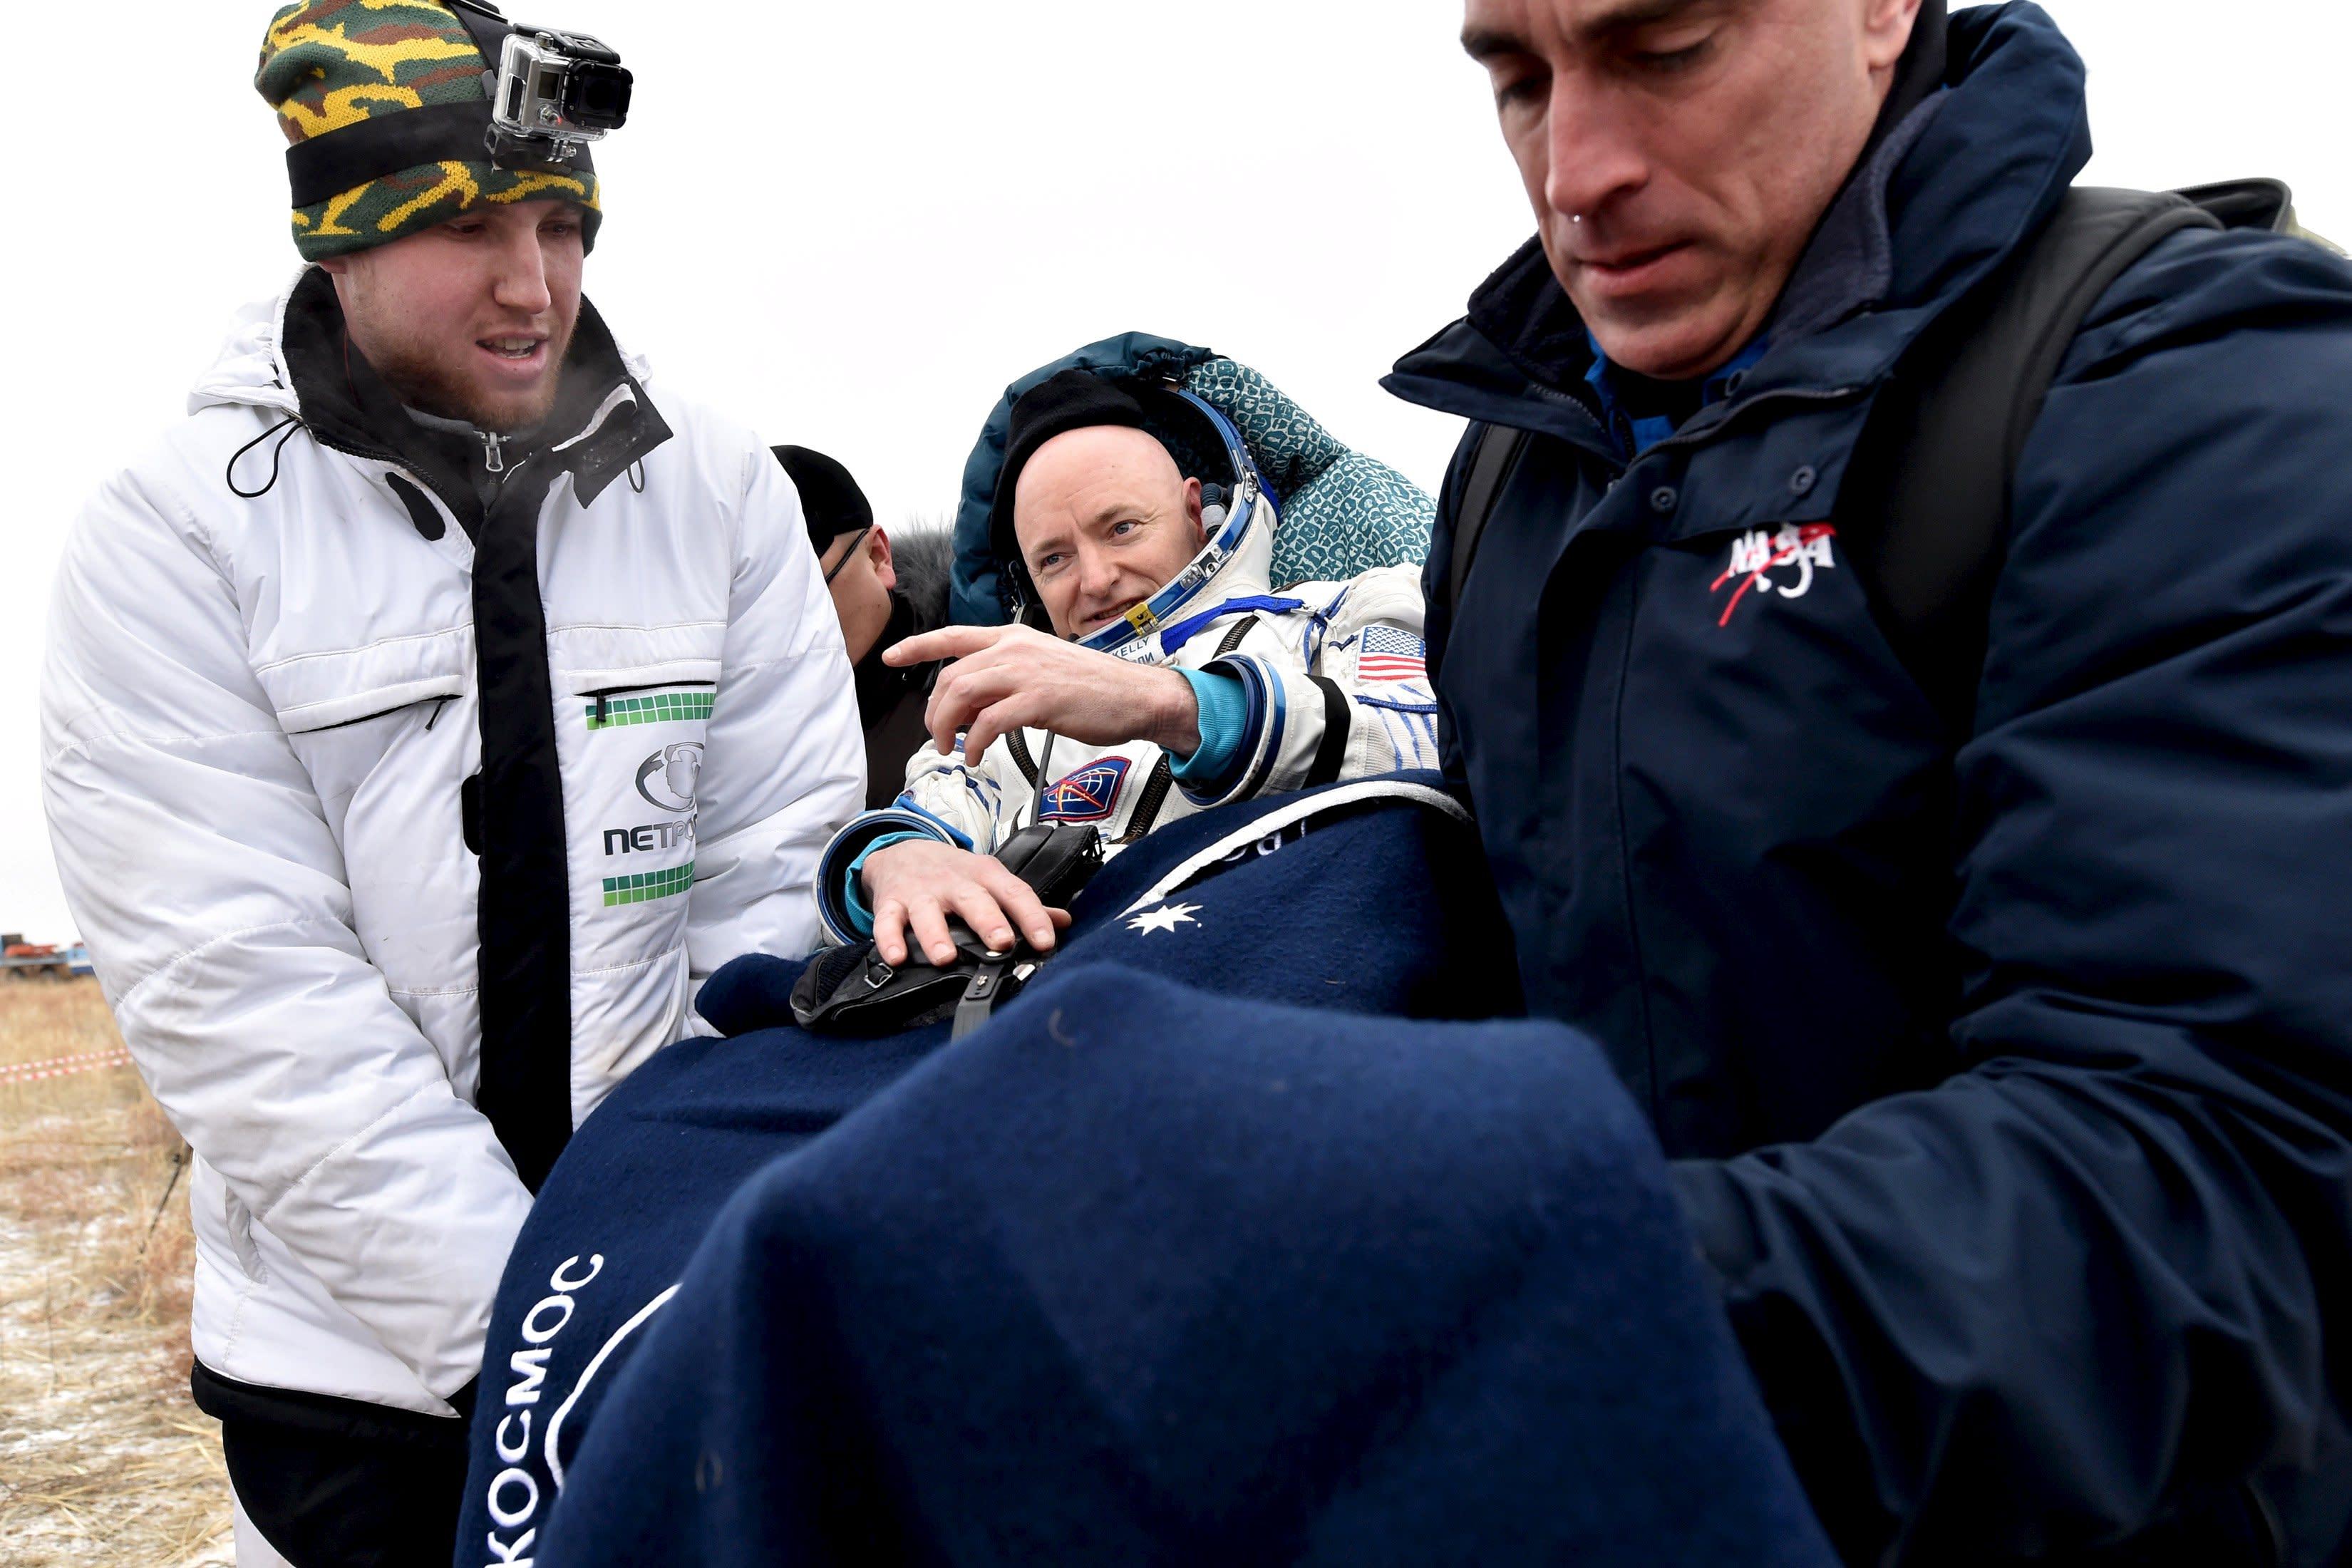 Ground personnel carry U.S. astronaut Scott Kelly shortly after landing near the town of Dzhezkazgan (Zhezkazgan), Kazakhstan, March 2, 2016. REUTERS/Kirill Kudryavtsev/Pool